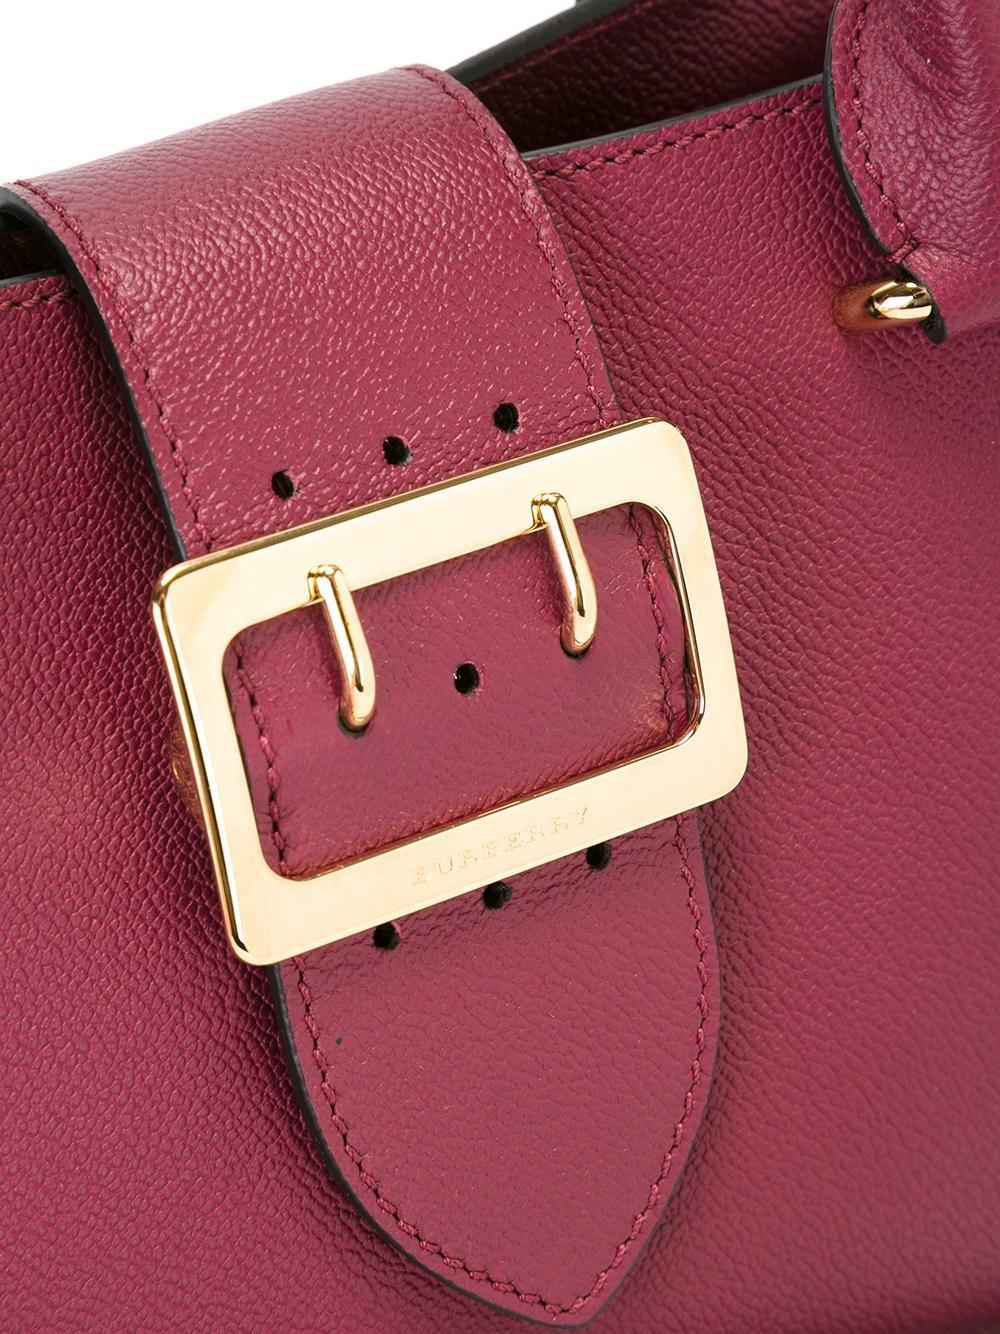 Burberry Leather Small Buckle Handbag